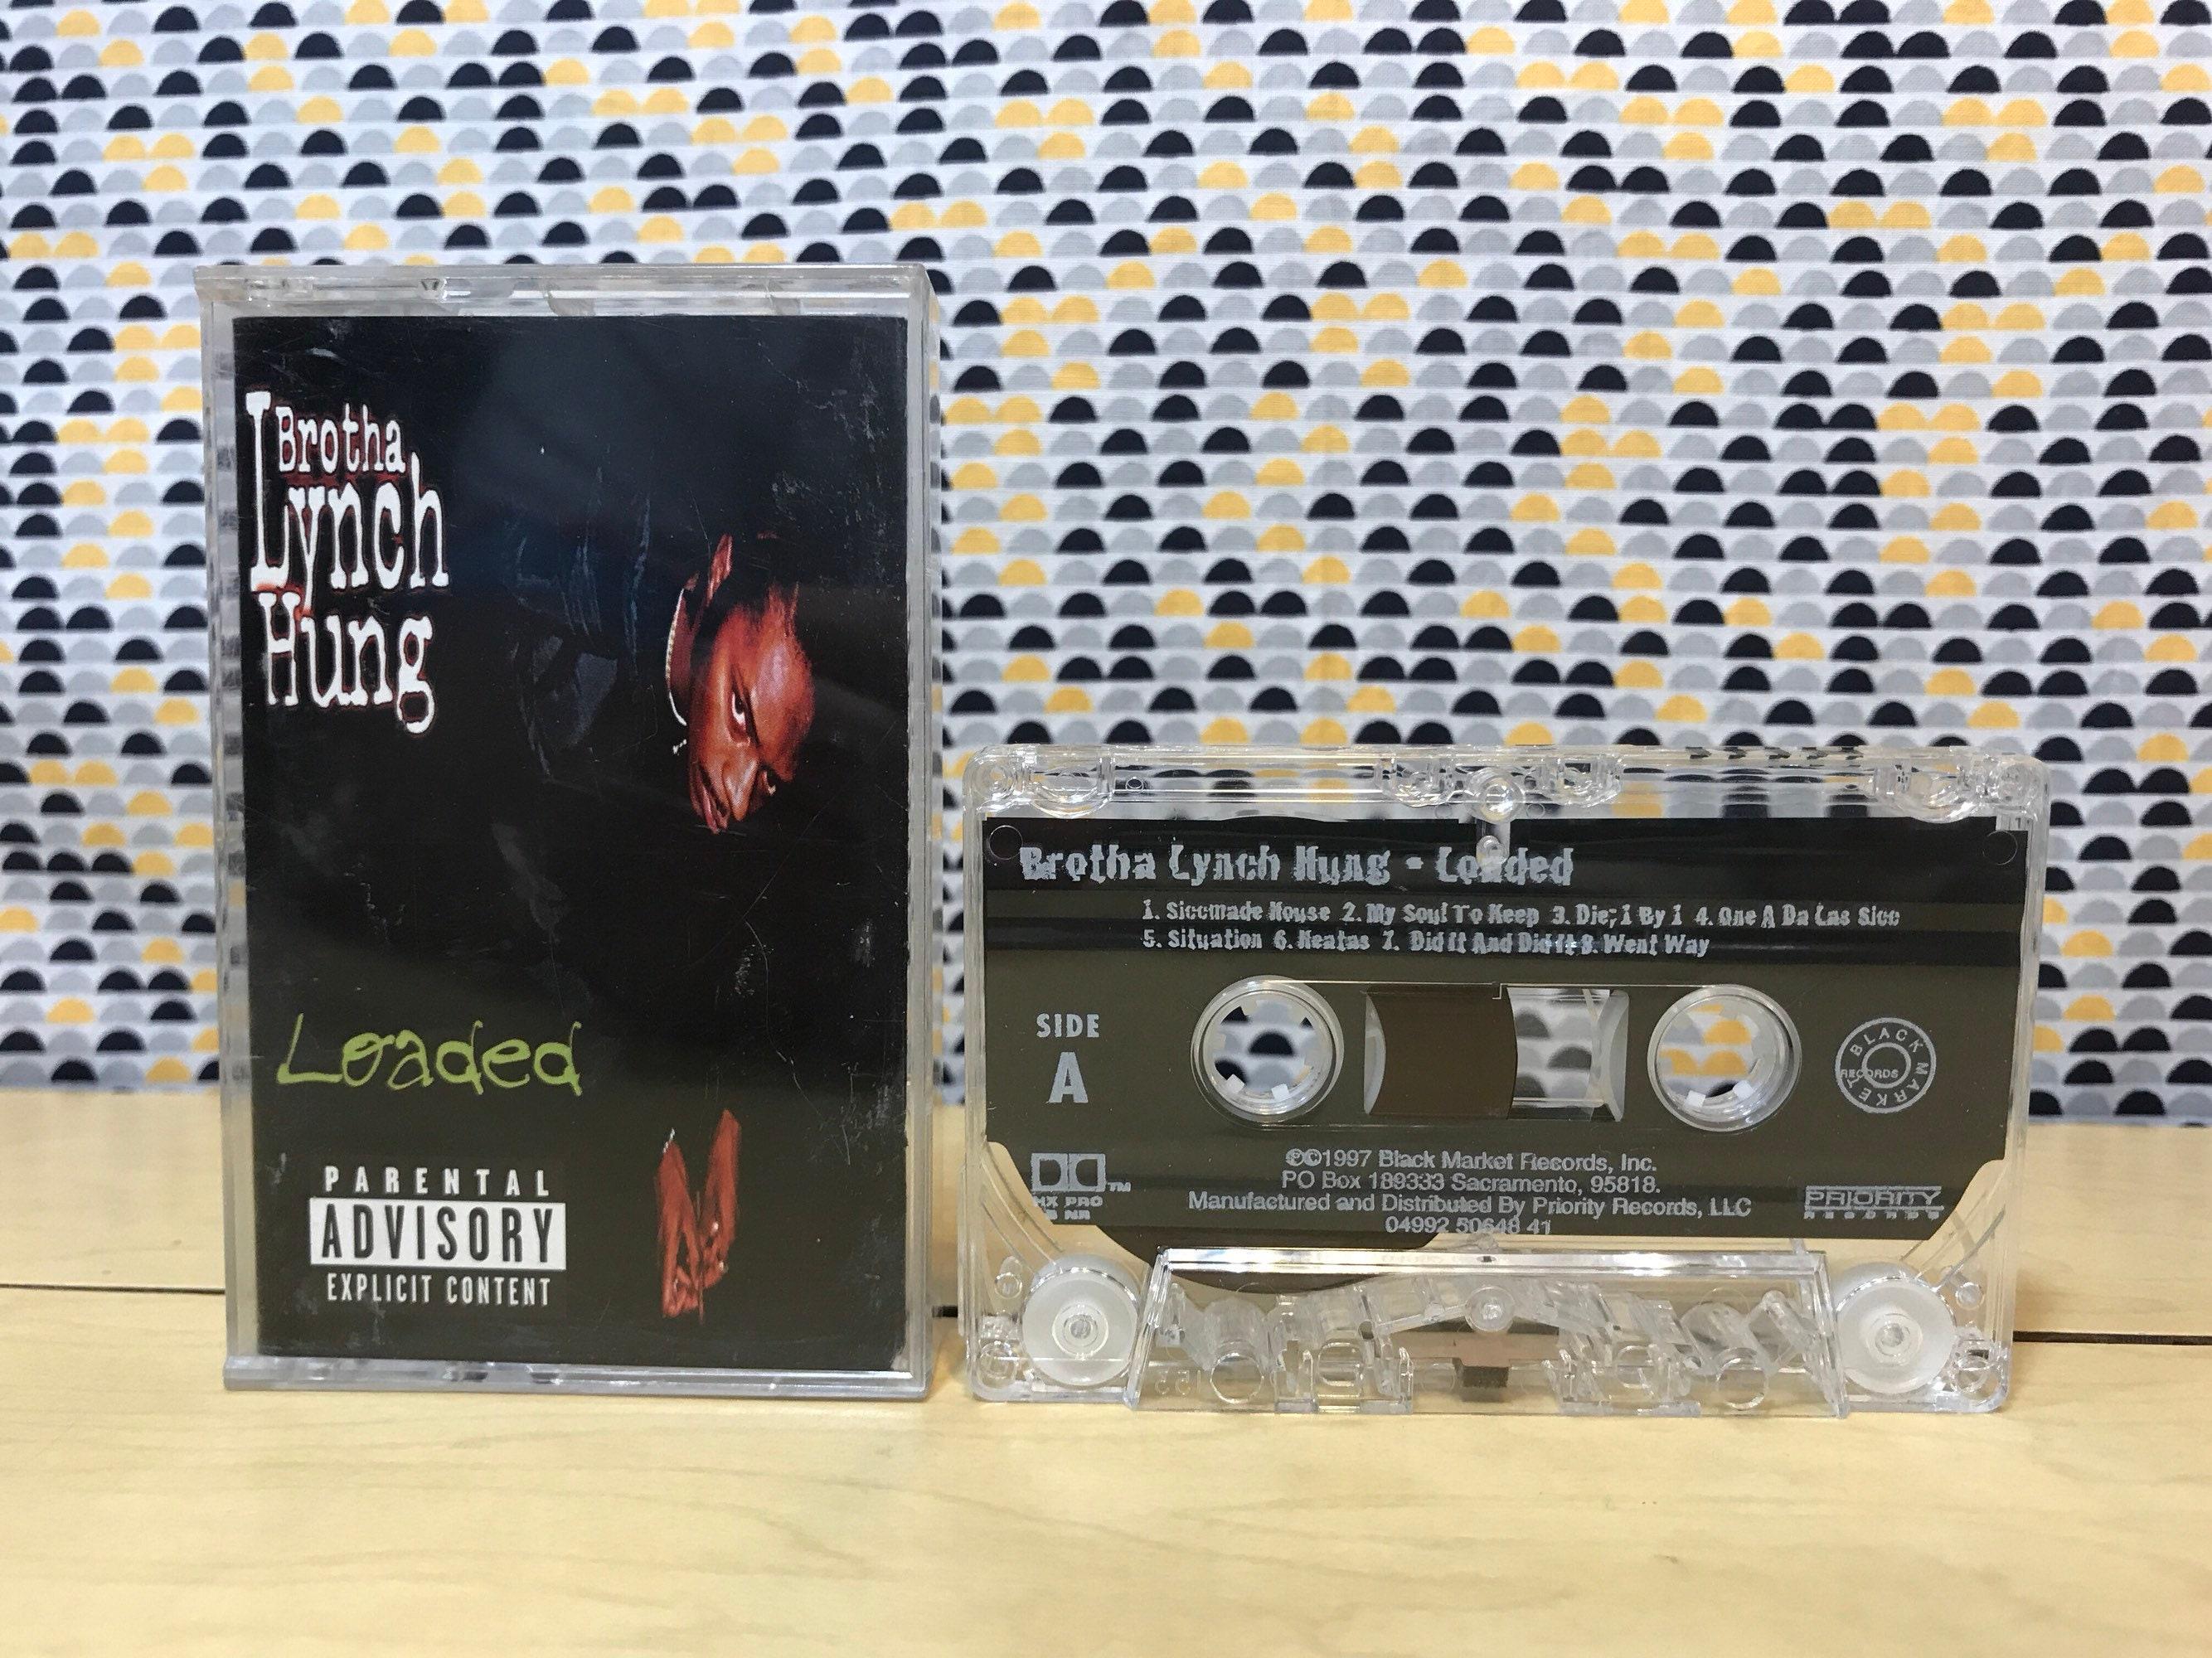 Brotha Lynch Hung - Loaded - Cassette tape - 1997 Black